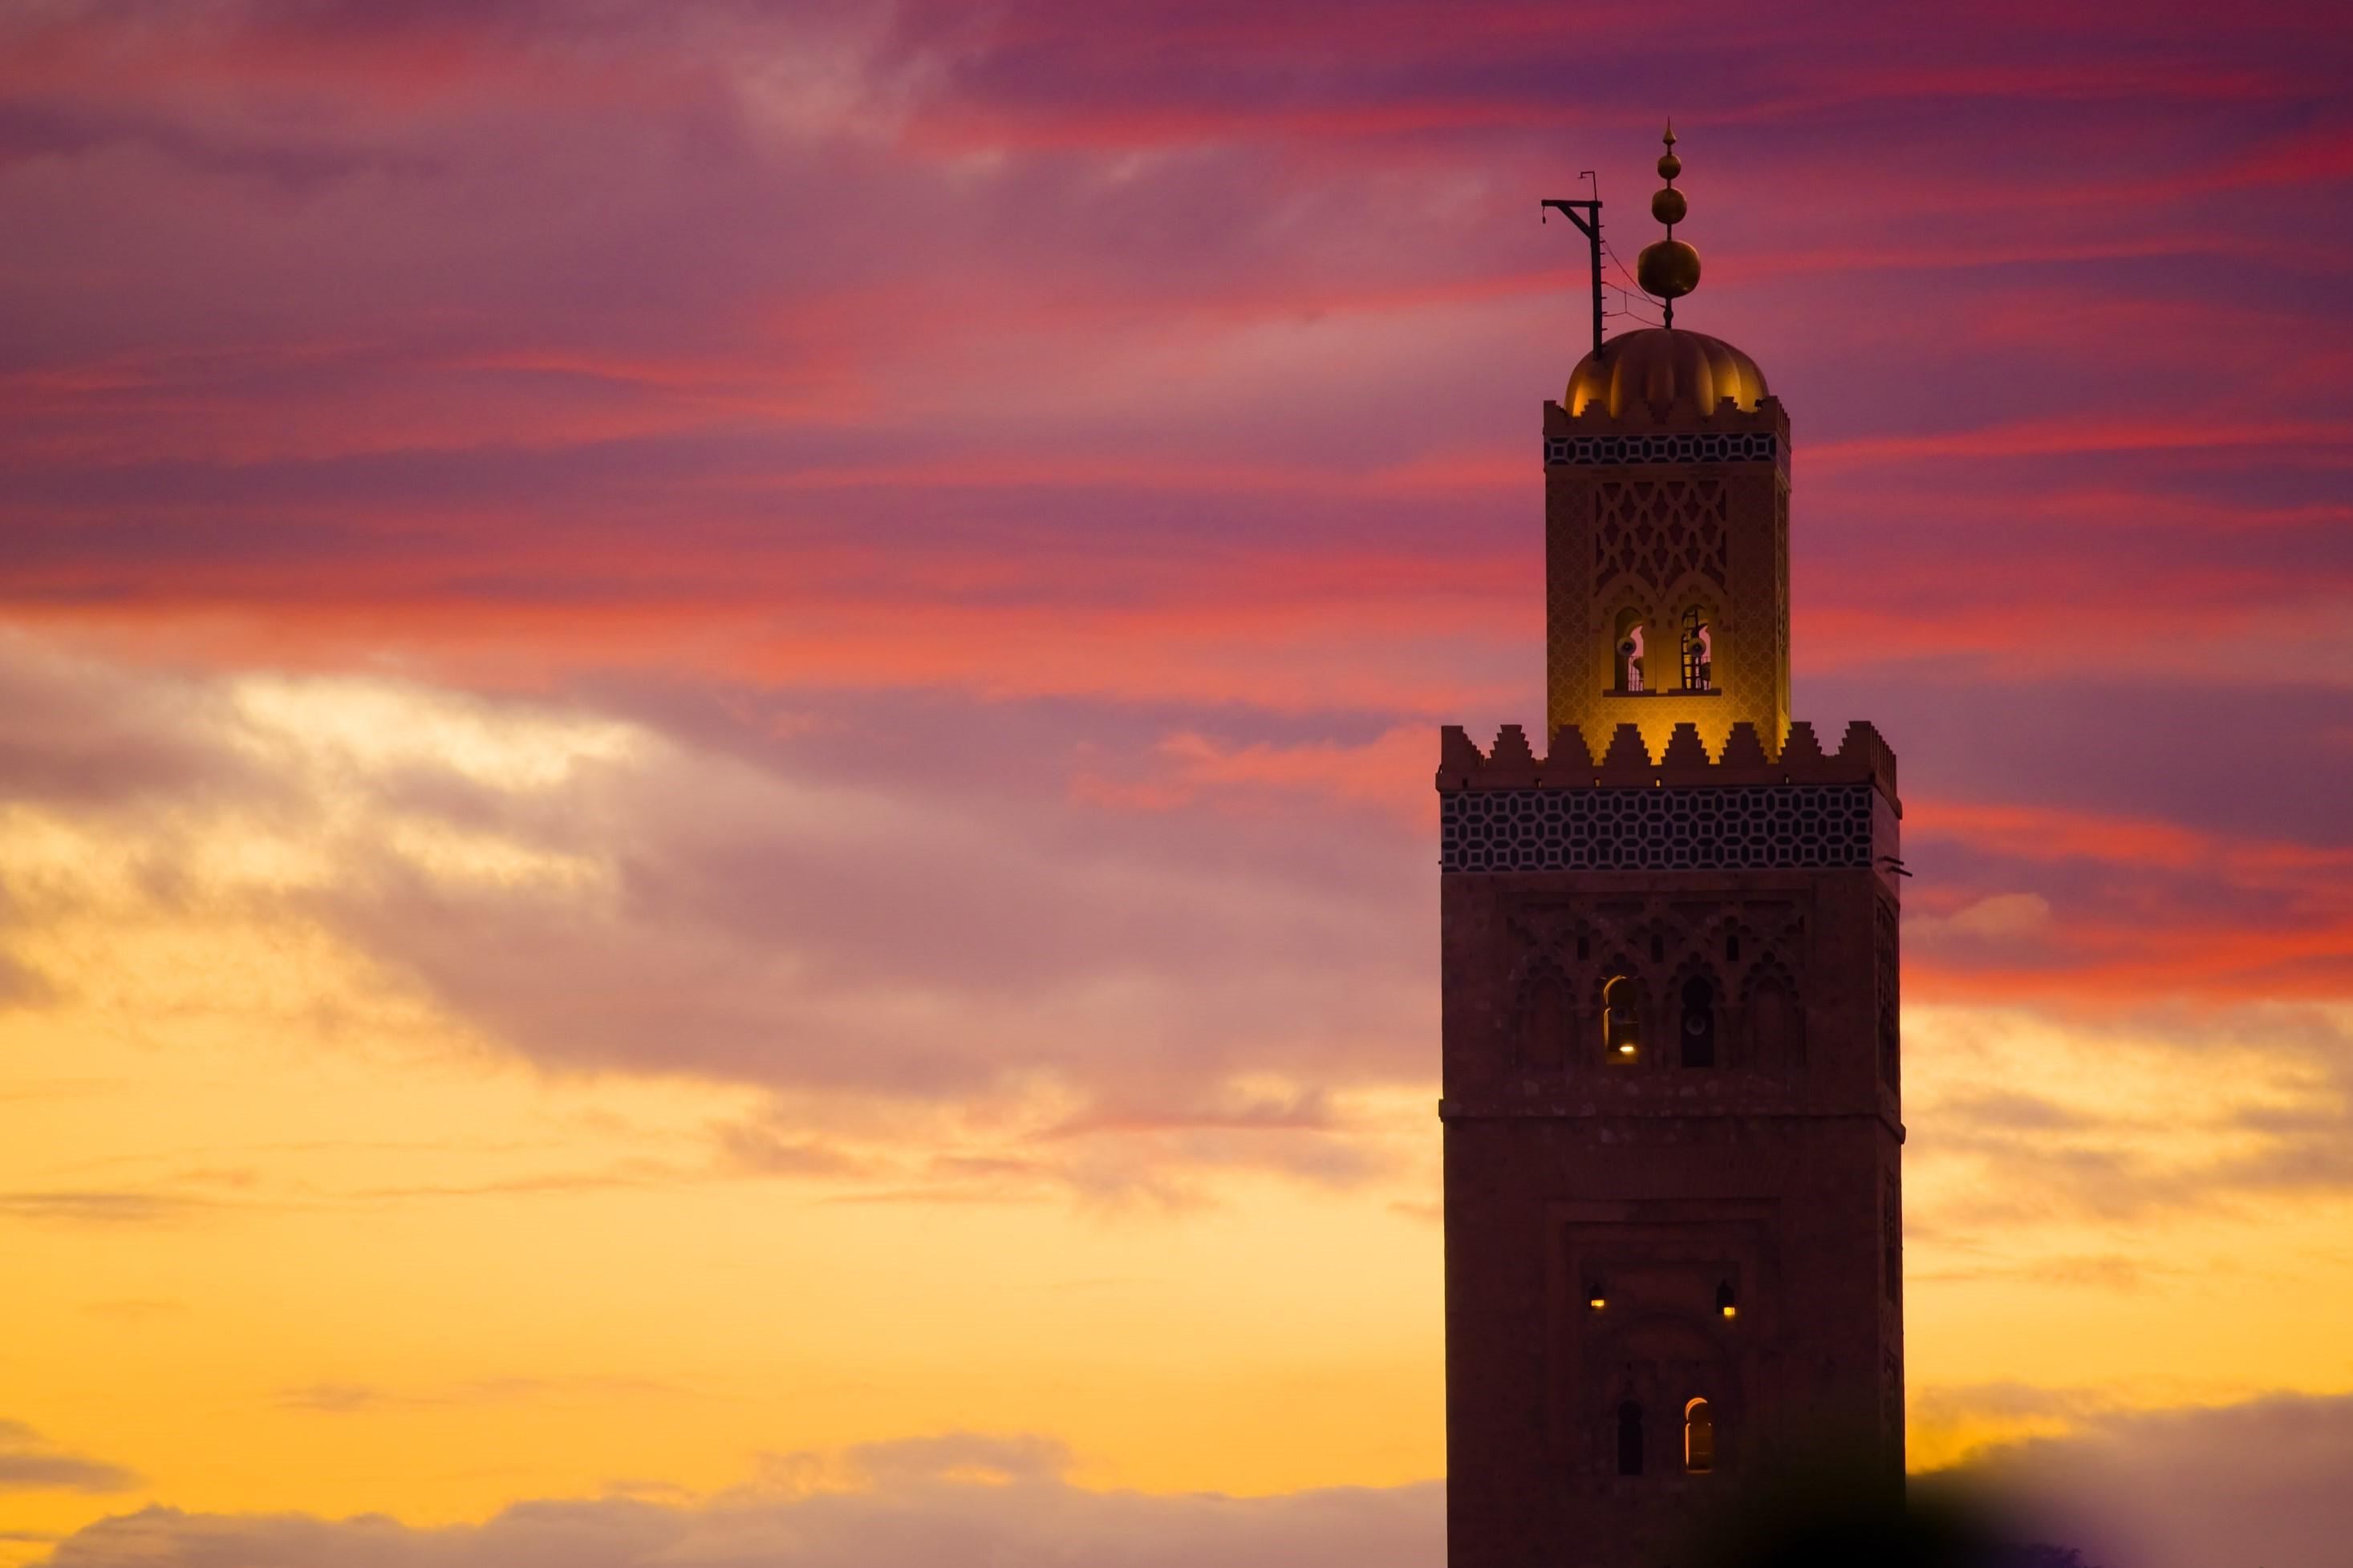 Marrakech. Lujo gastronómico. Nuba everywhere. Koutobia